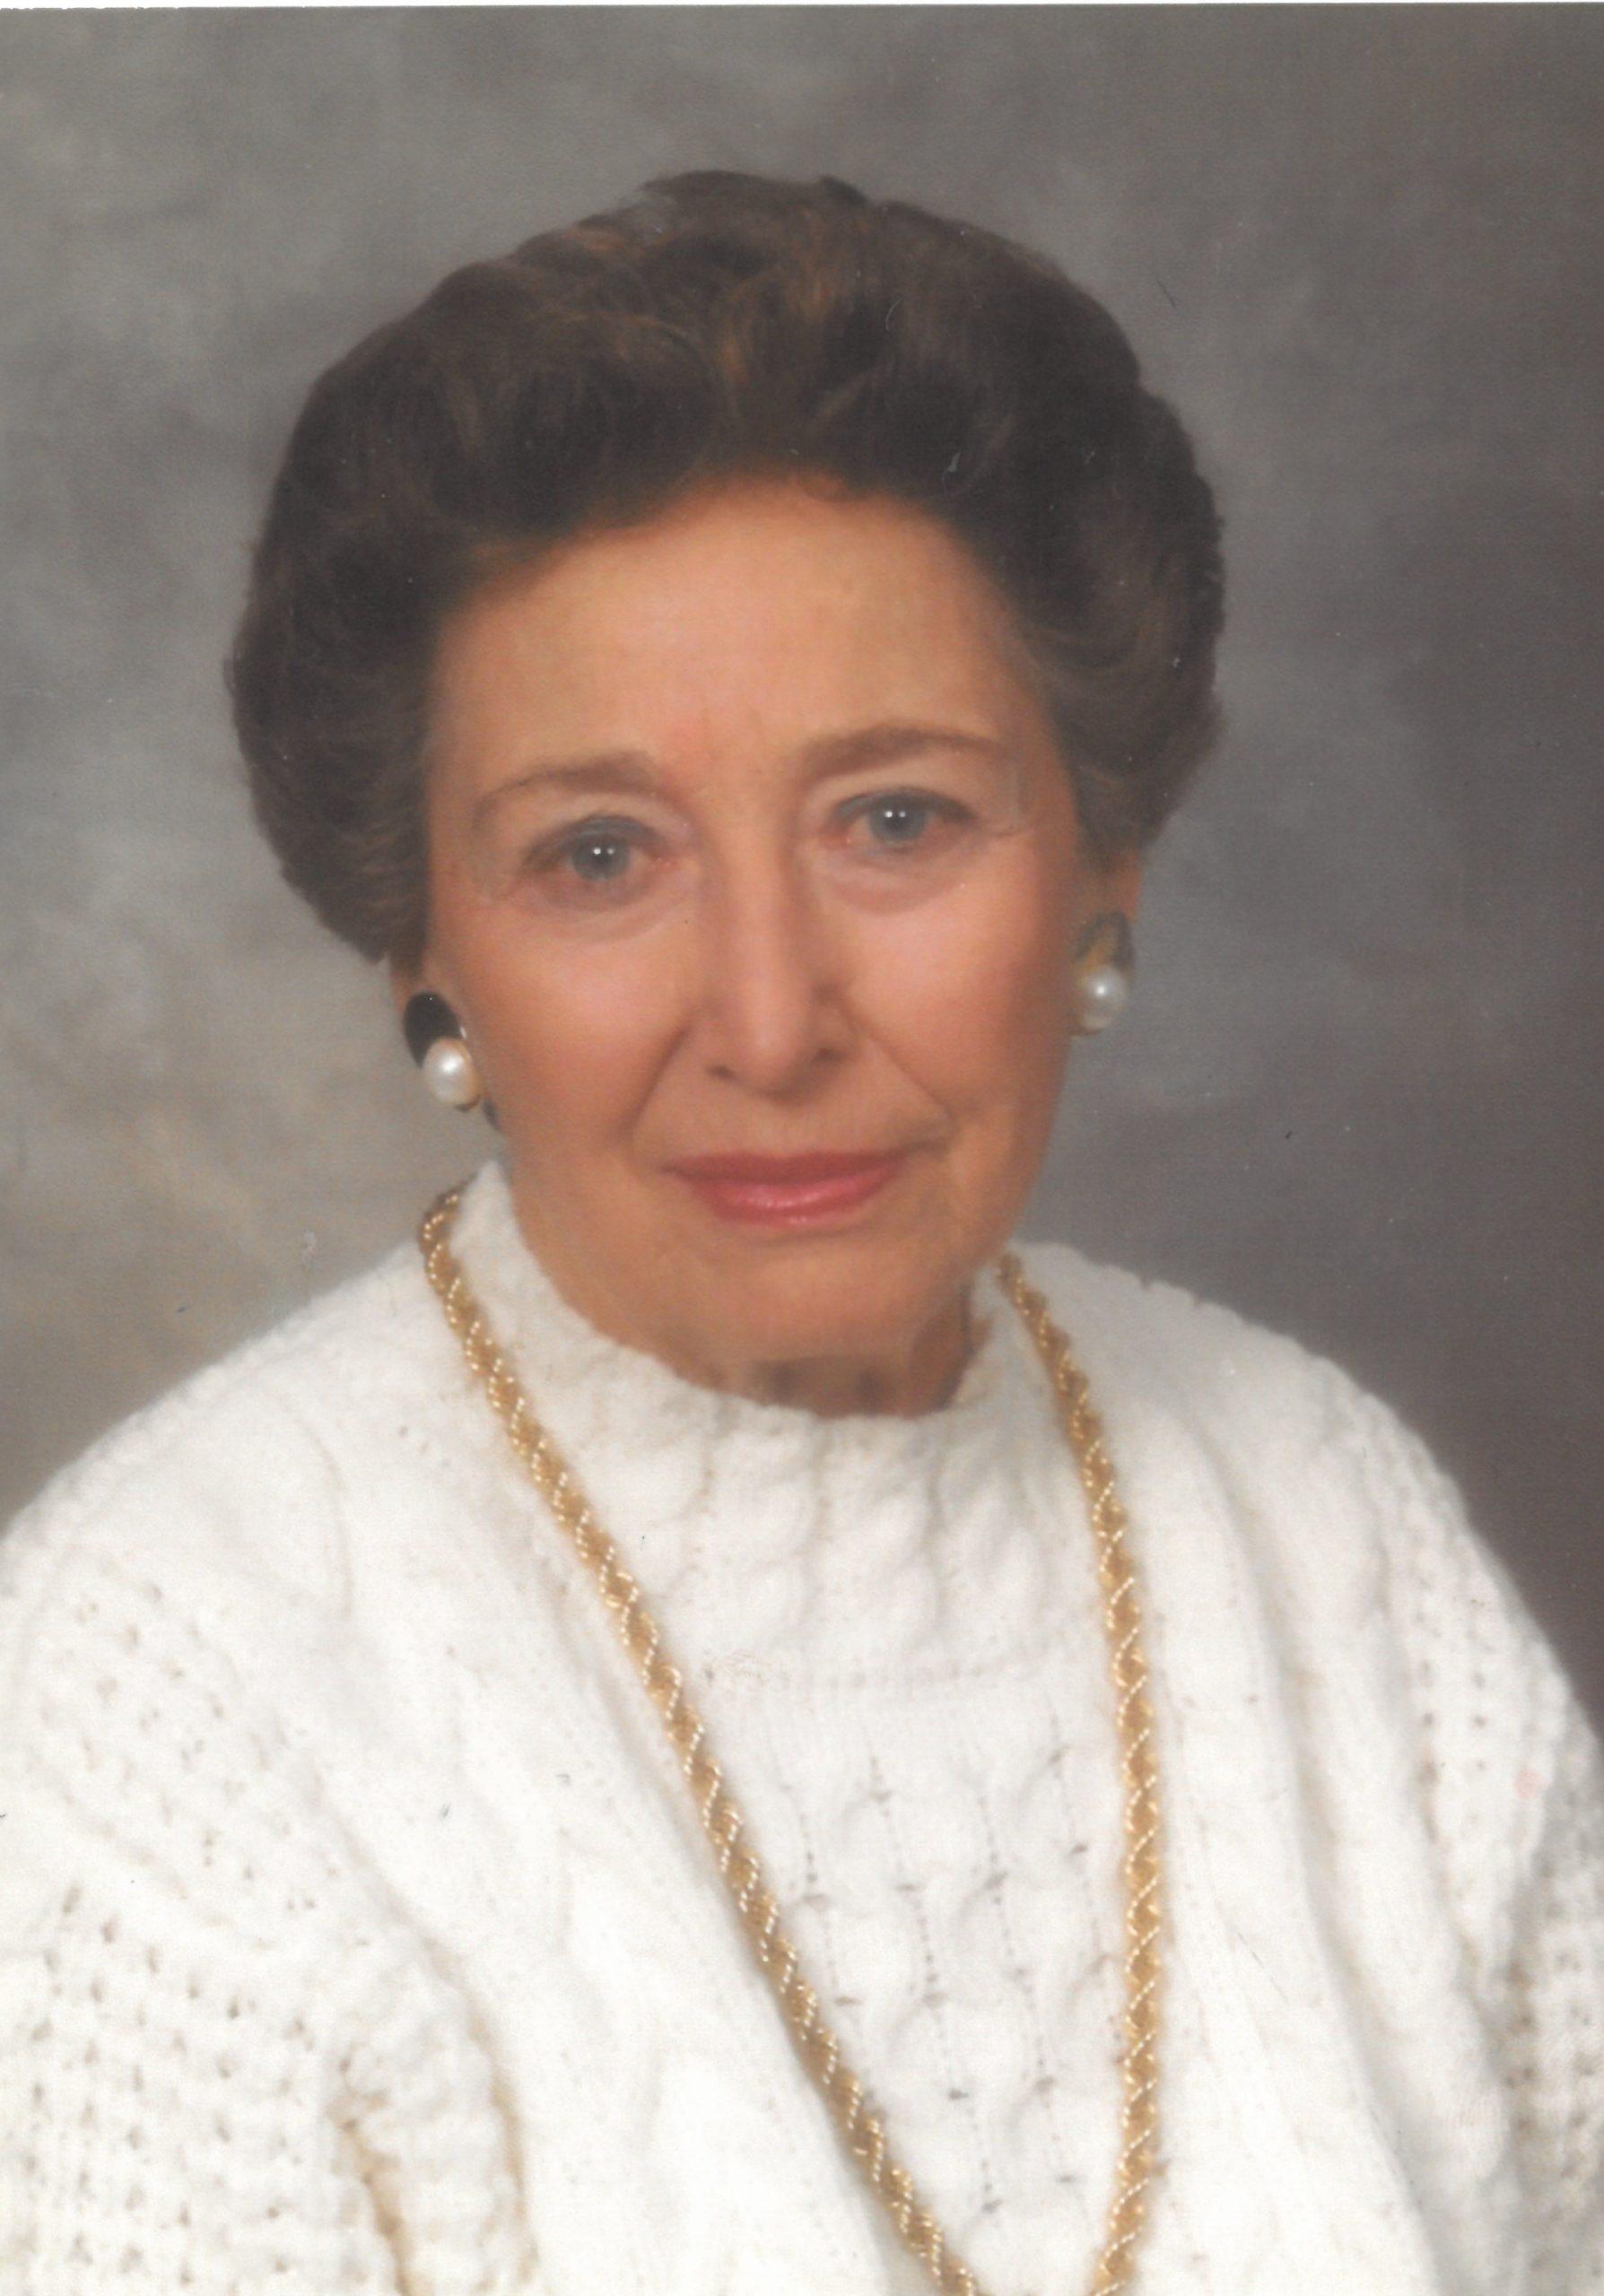 F. Parcher Obituary Photo scaled